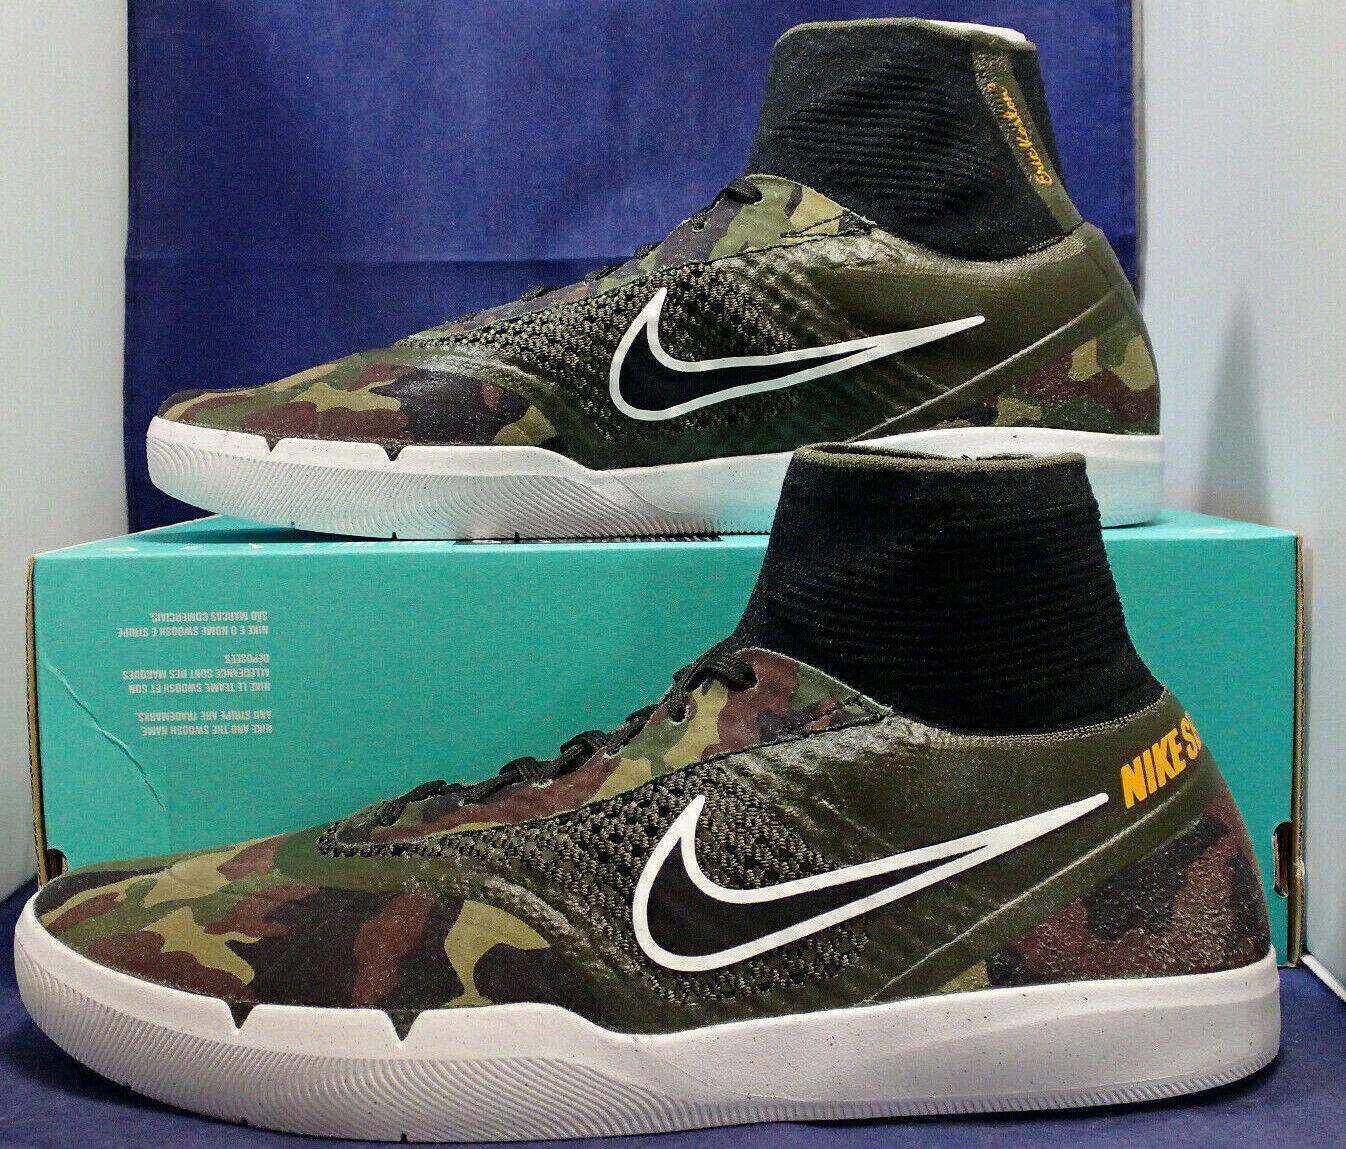 Nike SB Hyperfeel Eric Koston 3 Camo Cargo Khaki SZ 10.5 ( 819673-381 )